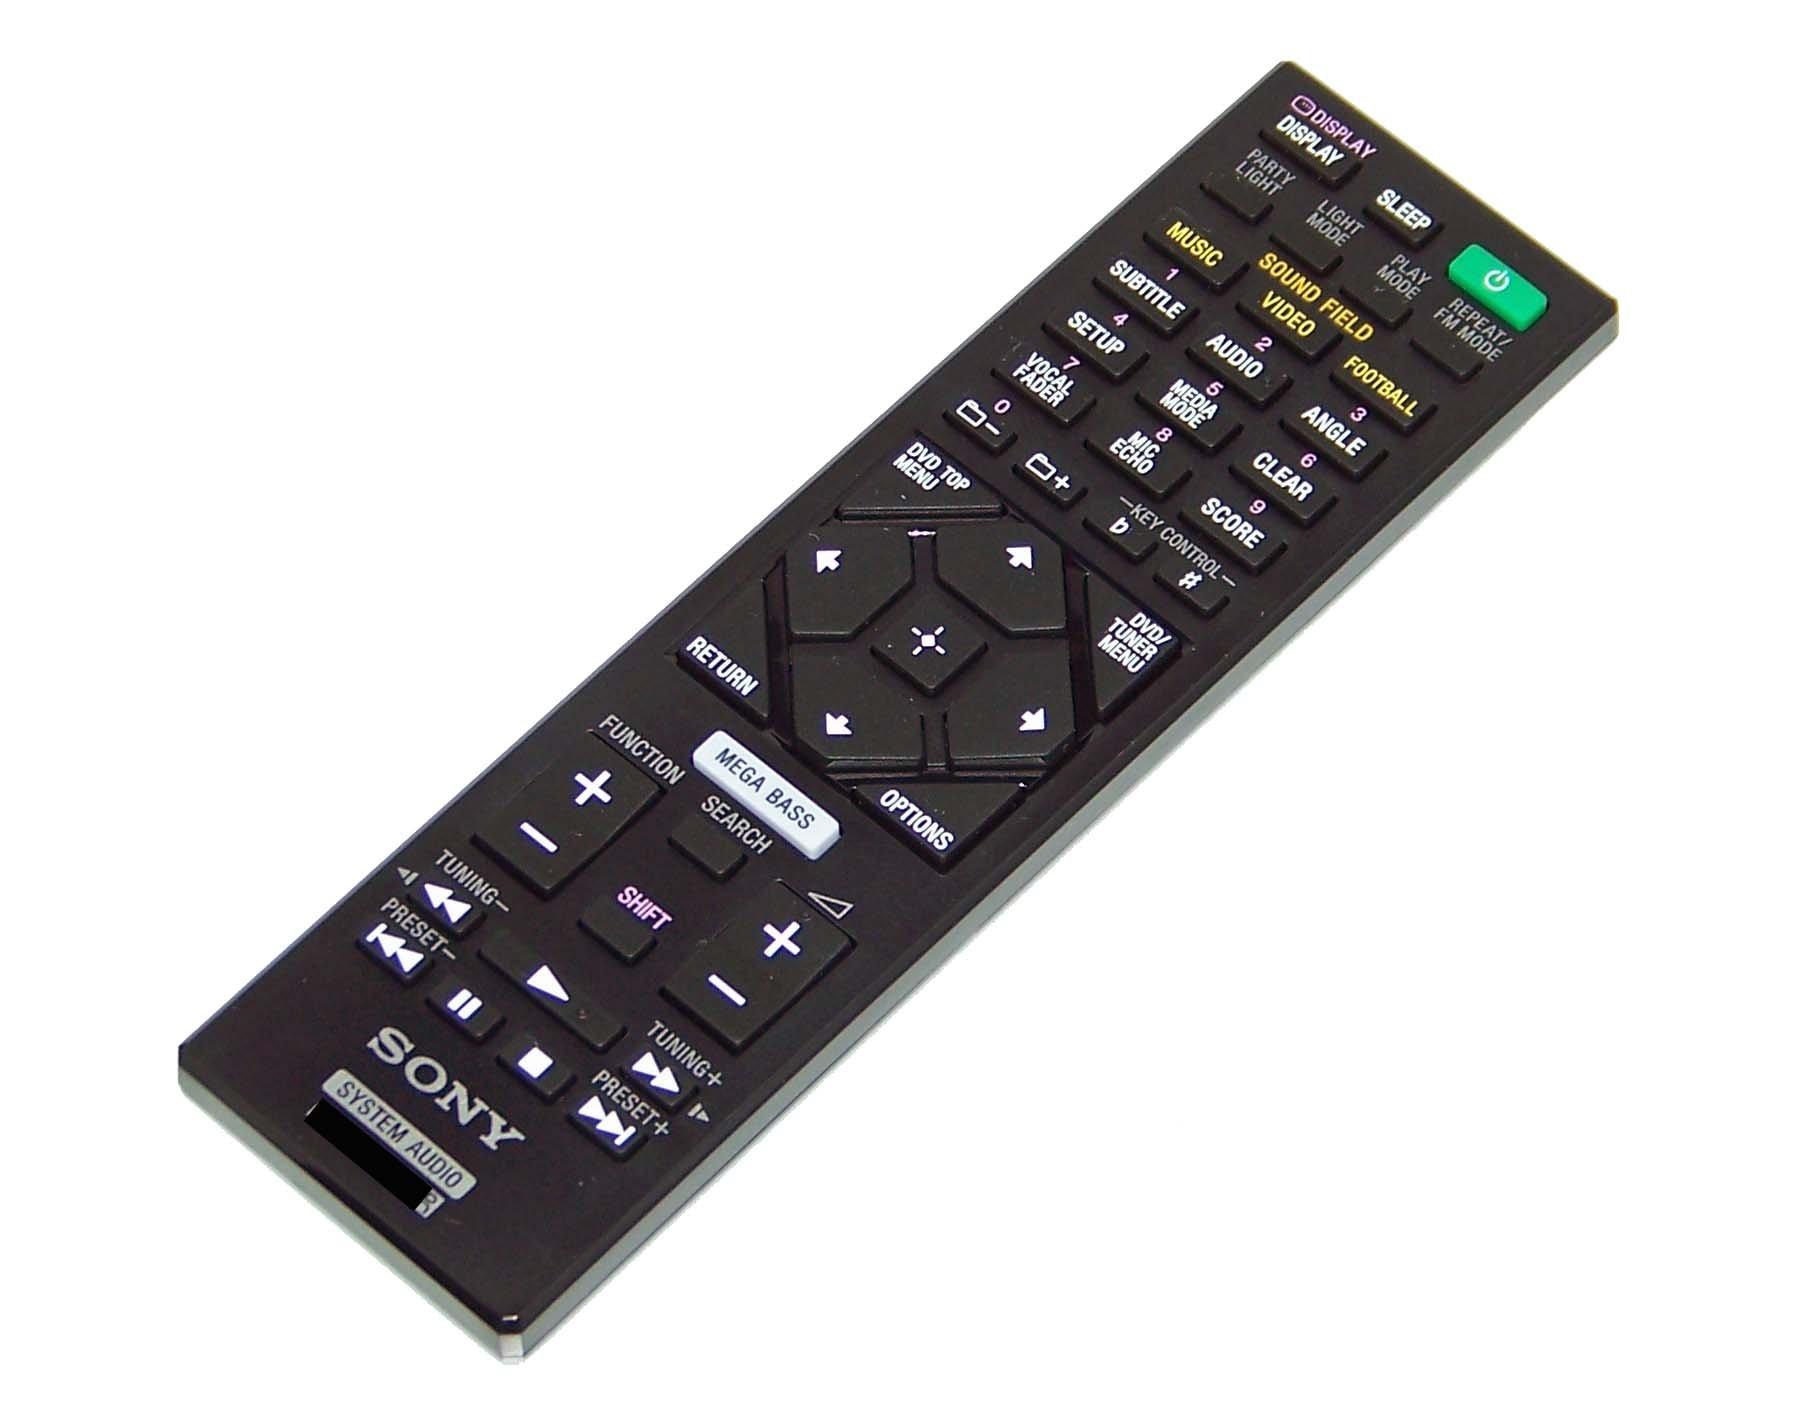 OEM Sony Remote Control Originally Shipped With: HCDSHAKEX10, HCD-SHAKEX10, HCD SHAKEX10 by Sony